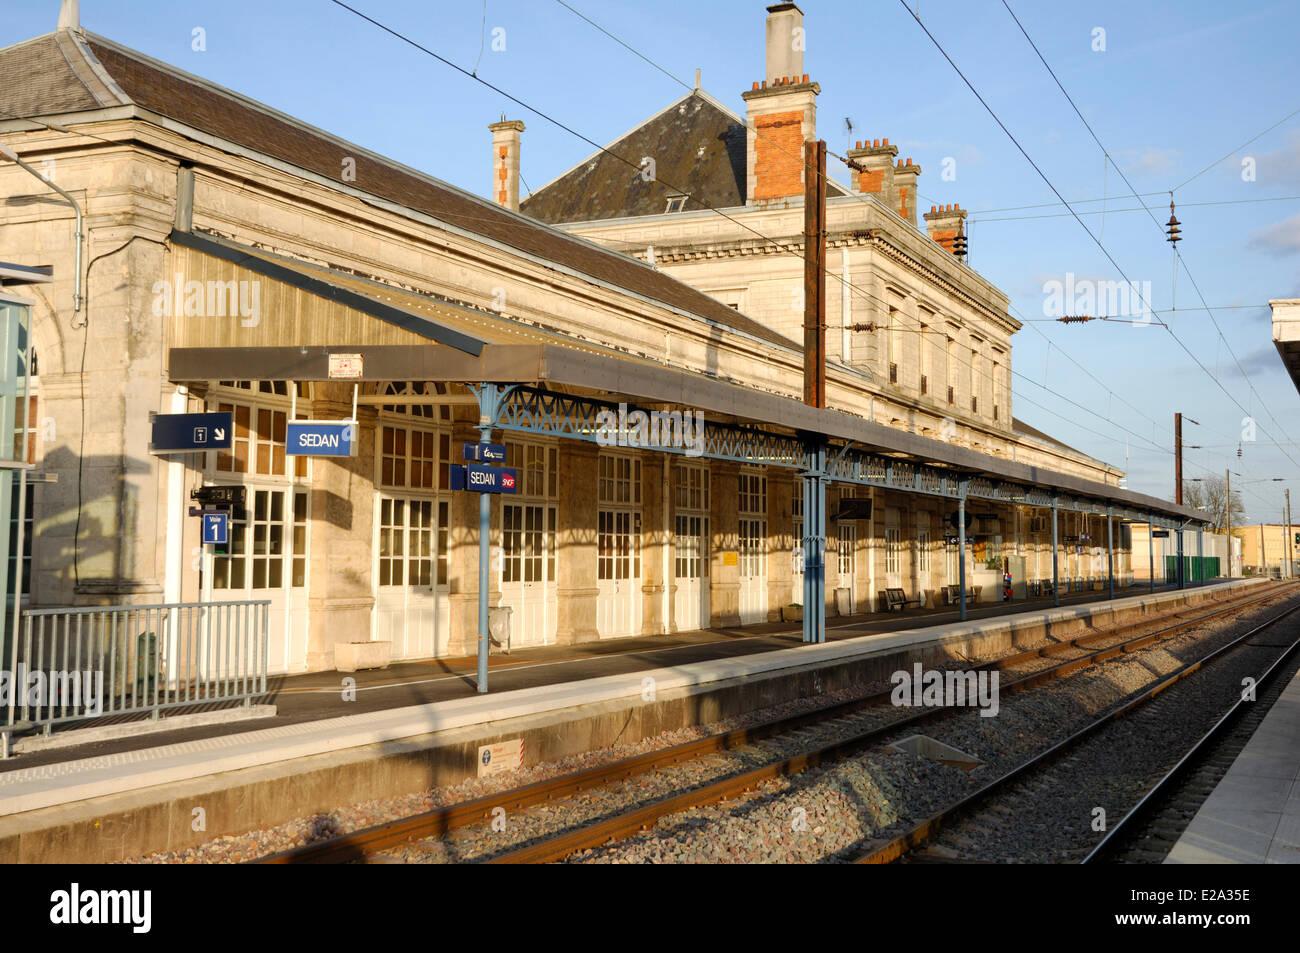 France, Ardennes, Sedan, Railway Train Station (SNCF) - Stock Image